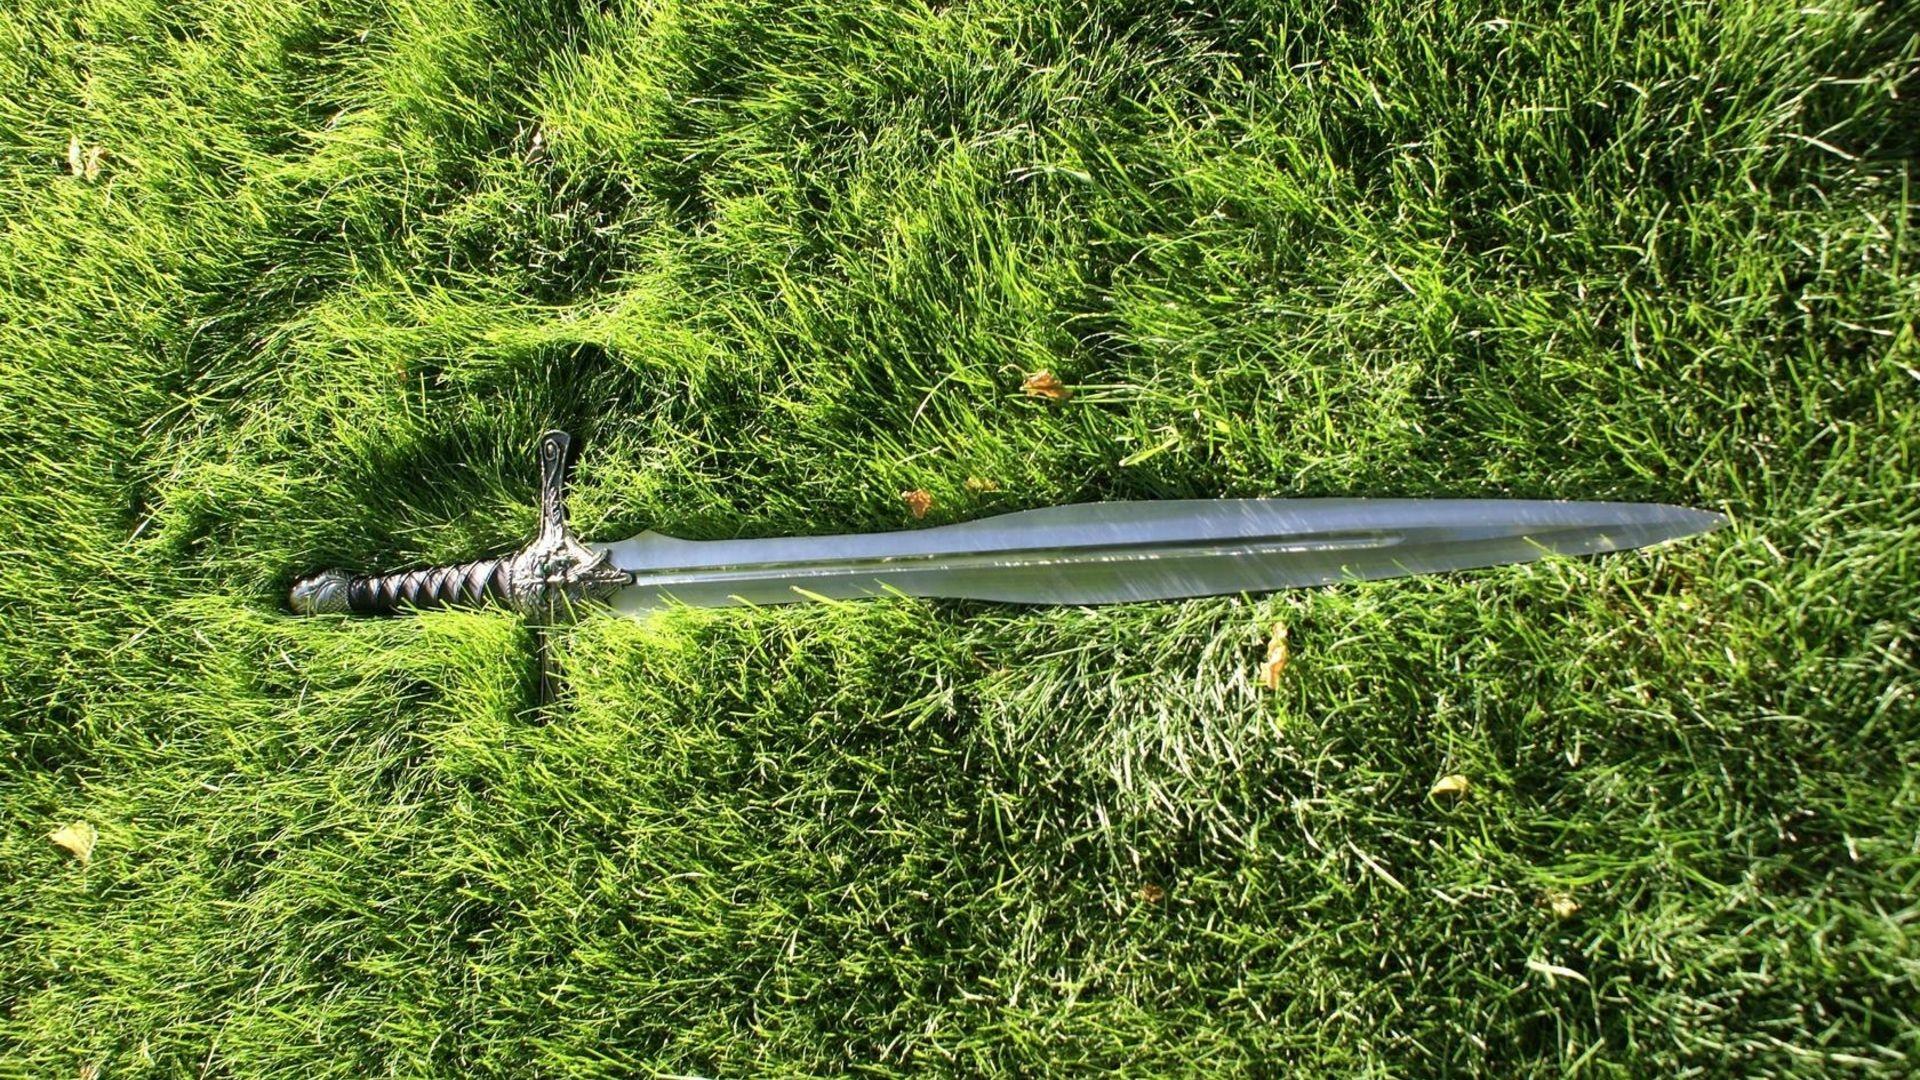 Sword wallpaper theme